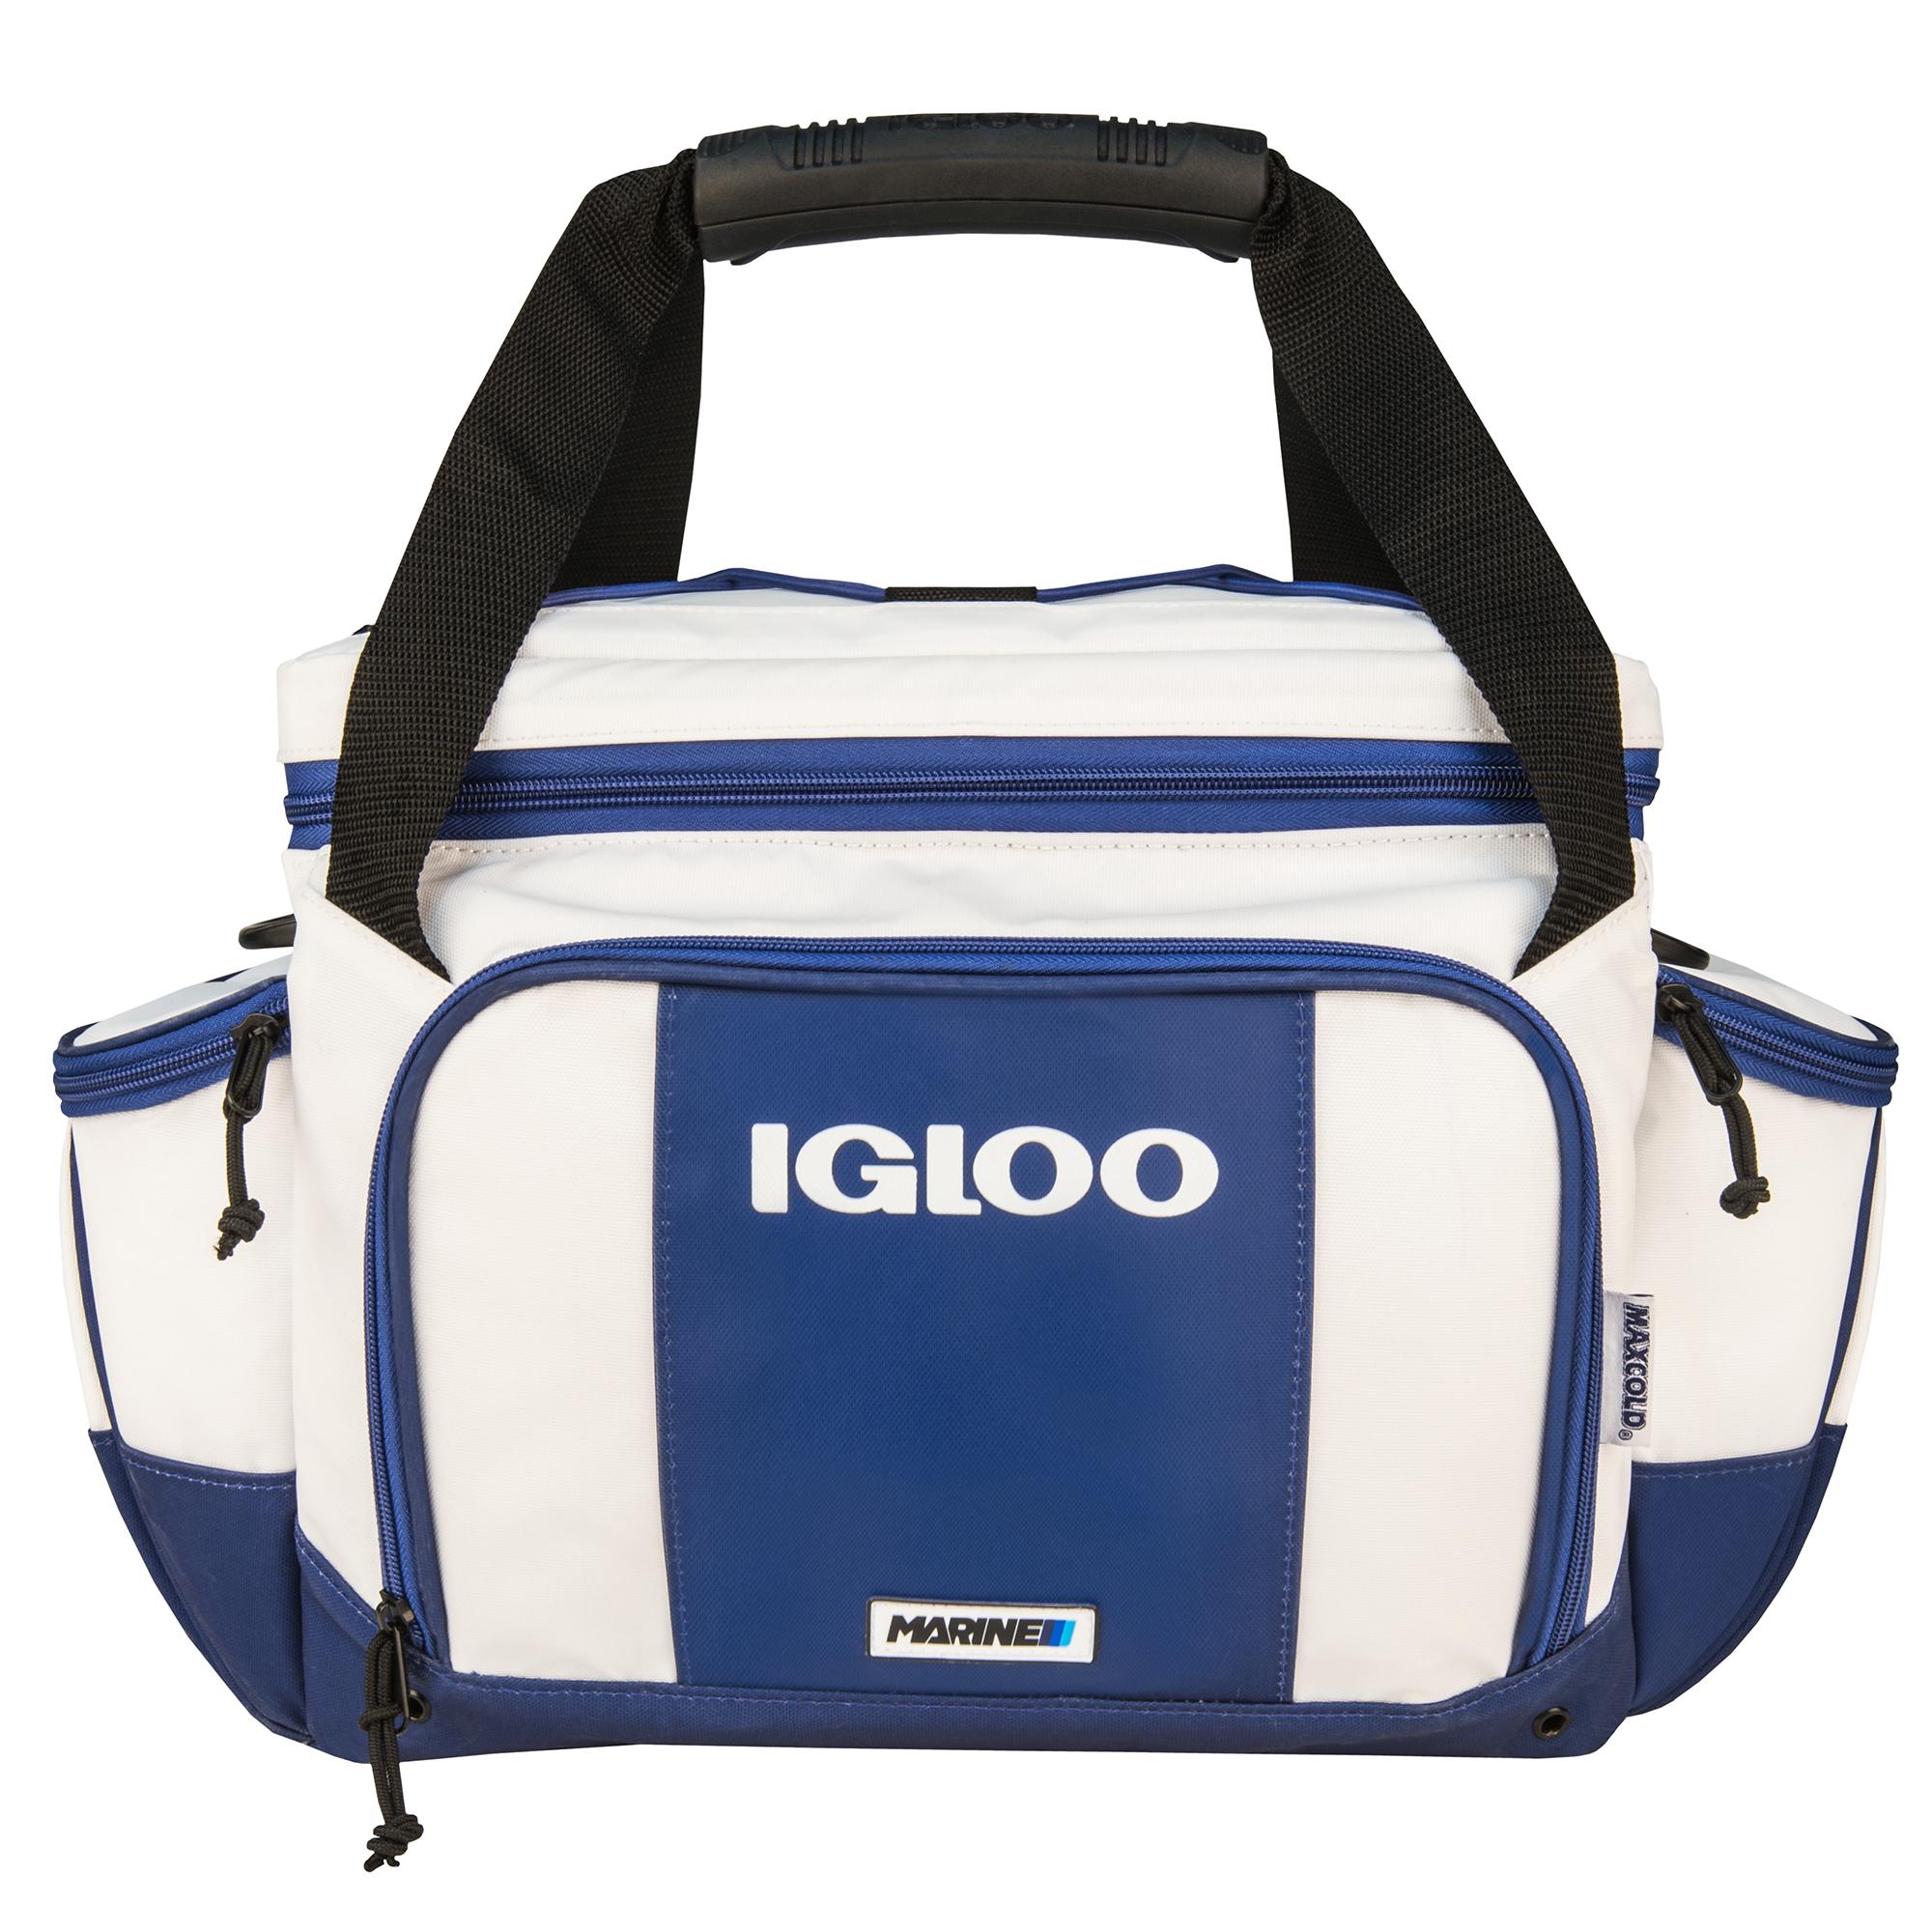 Igloo Marine Ultra 40-Can Tackle Box Cooler thumbnail